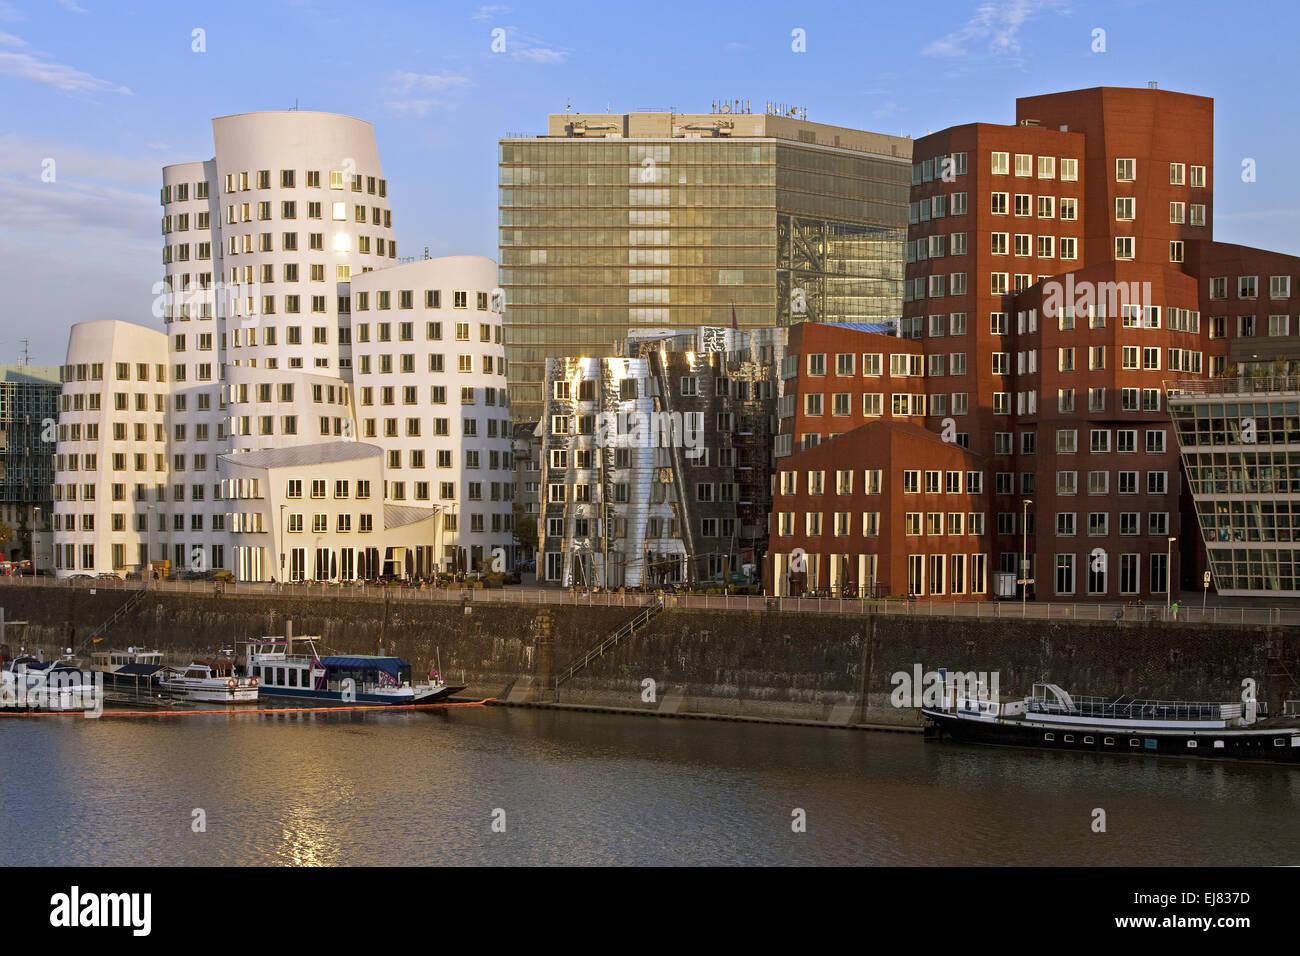 Gehry buildings, Duesseldorf, Germany - Stock Image